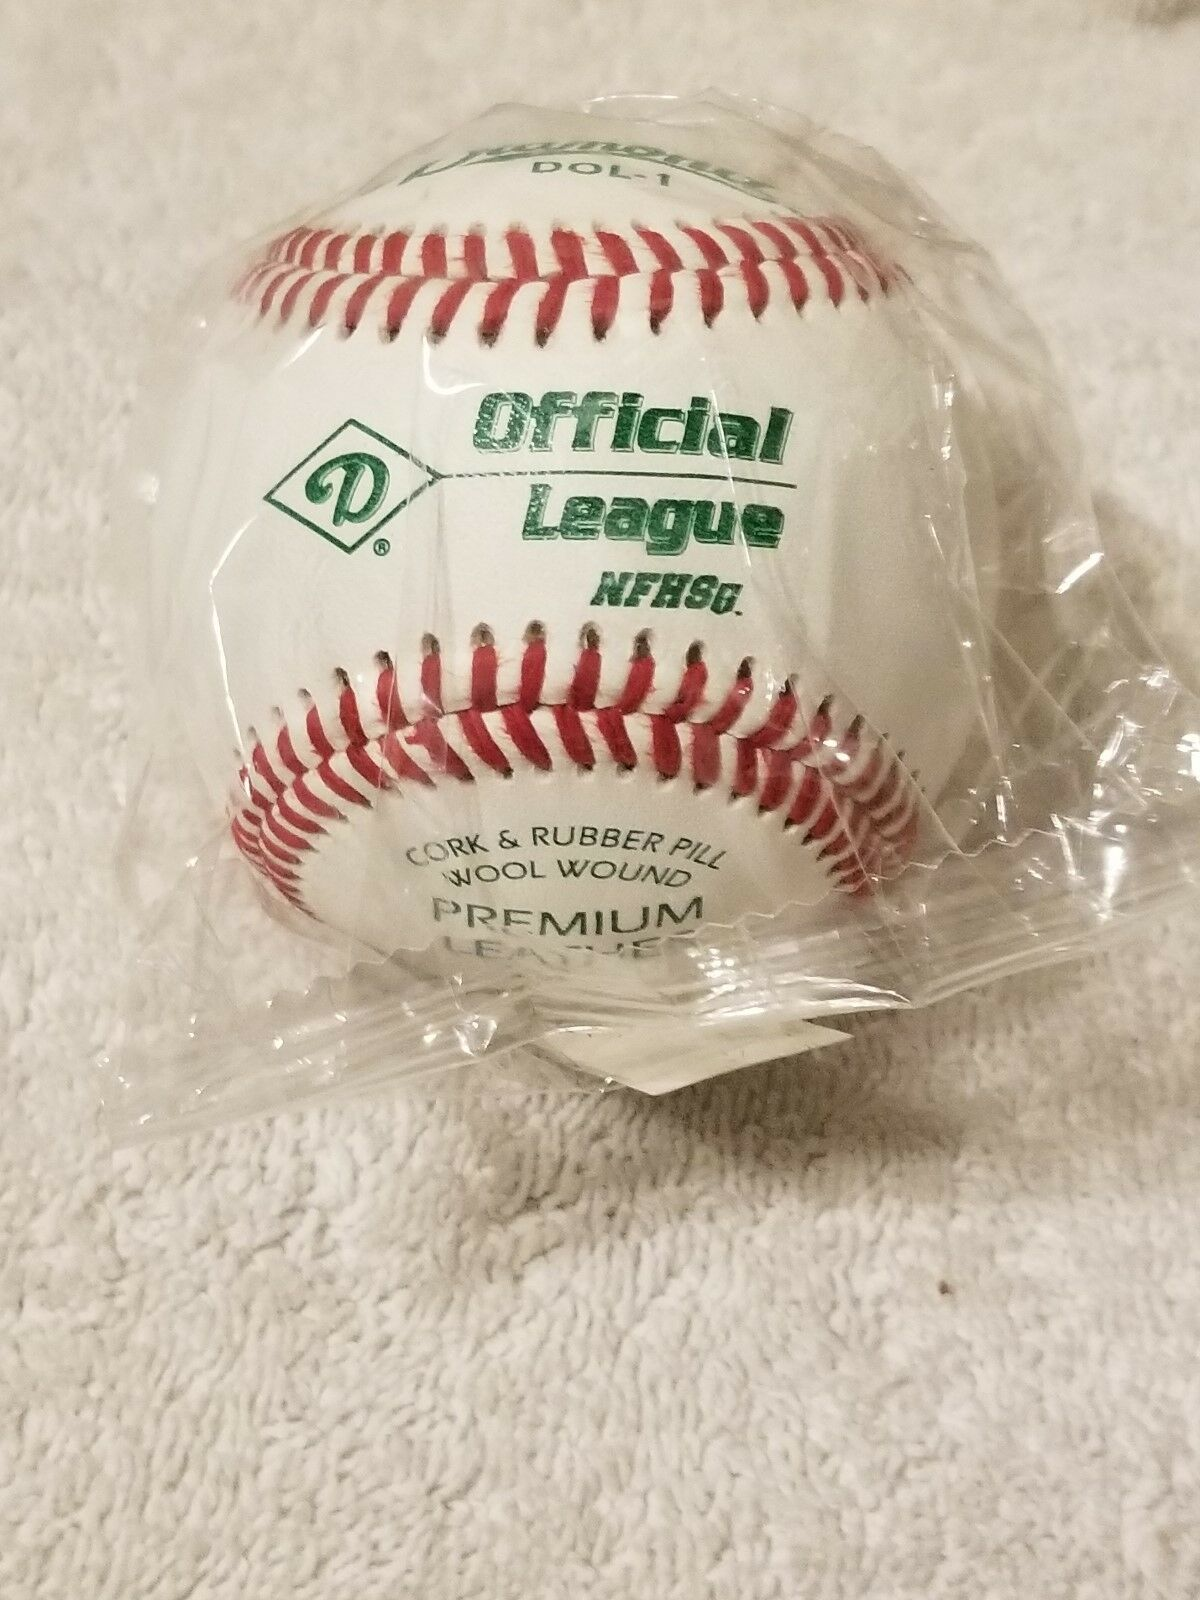 1 Dozen NEW Still in Wrapper Diamond DOL1-NFHS Baseballs High School Approved